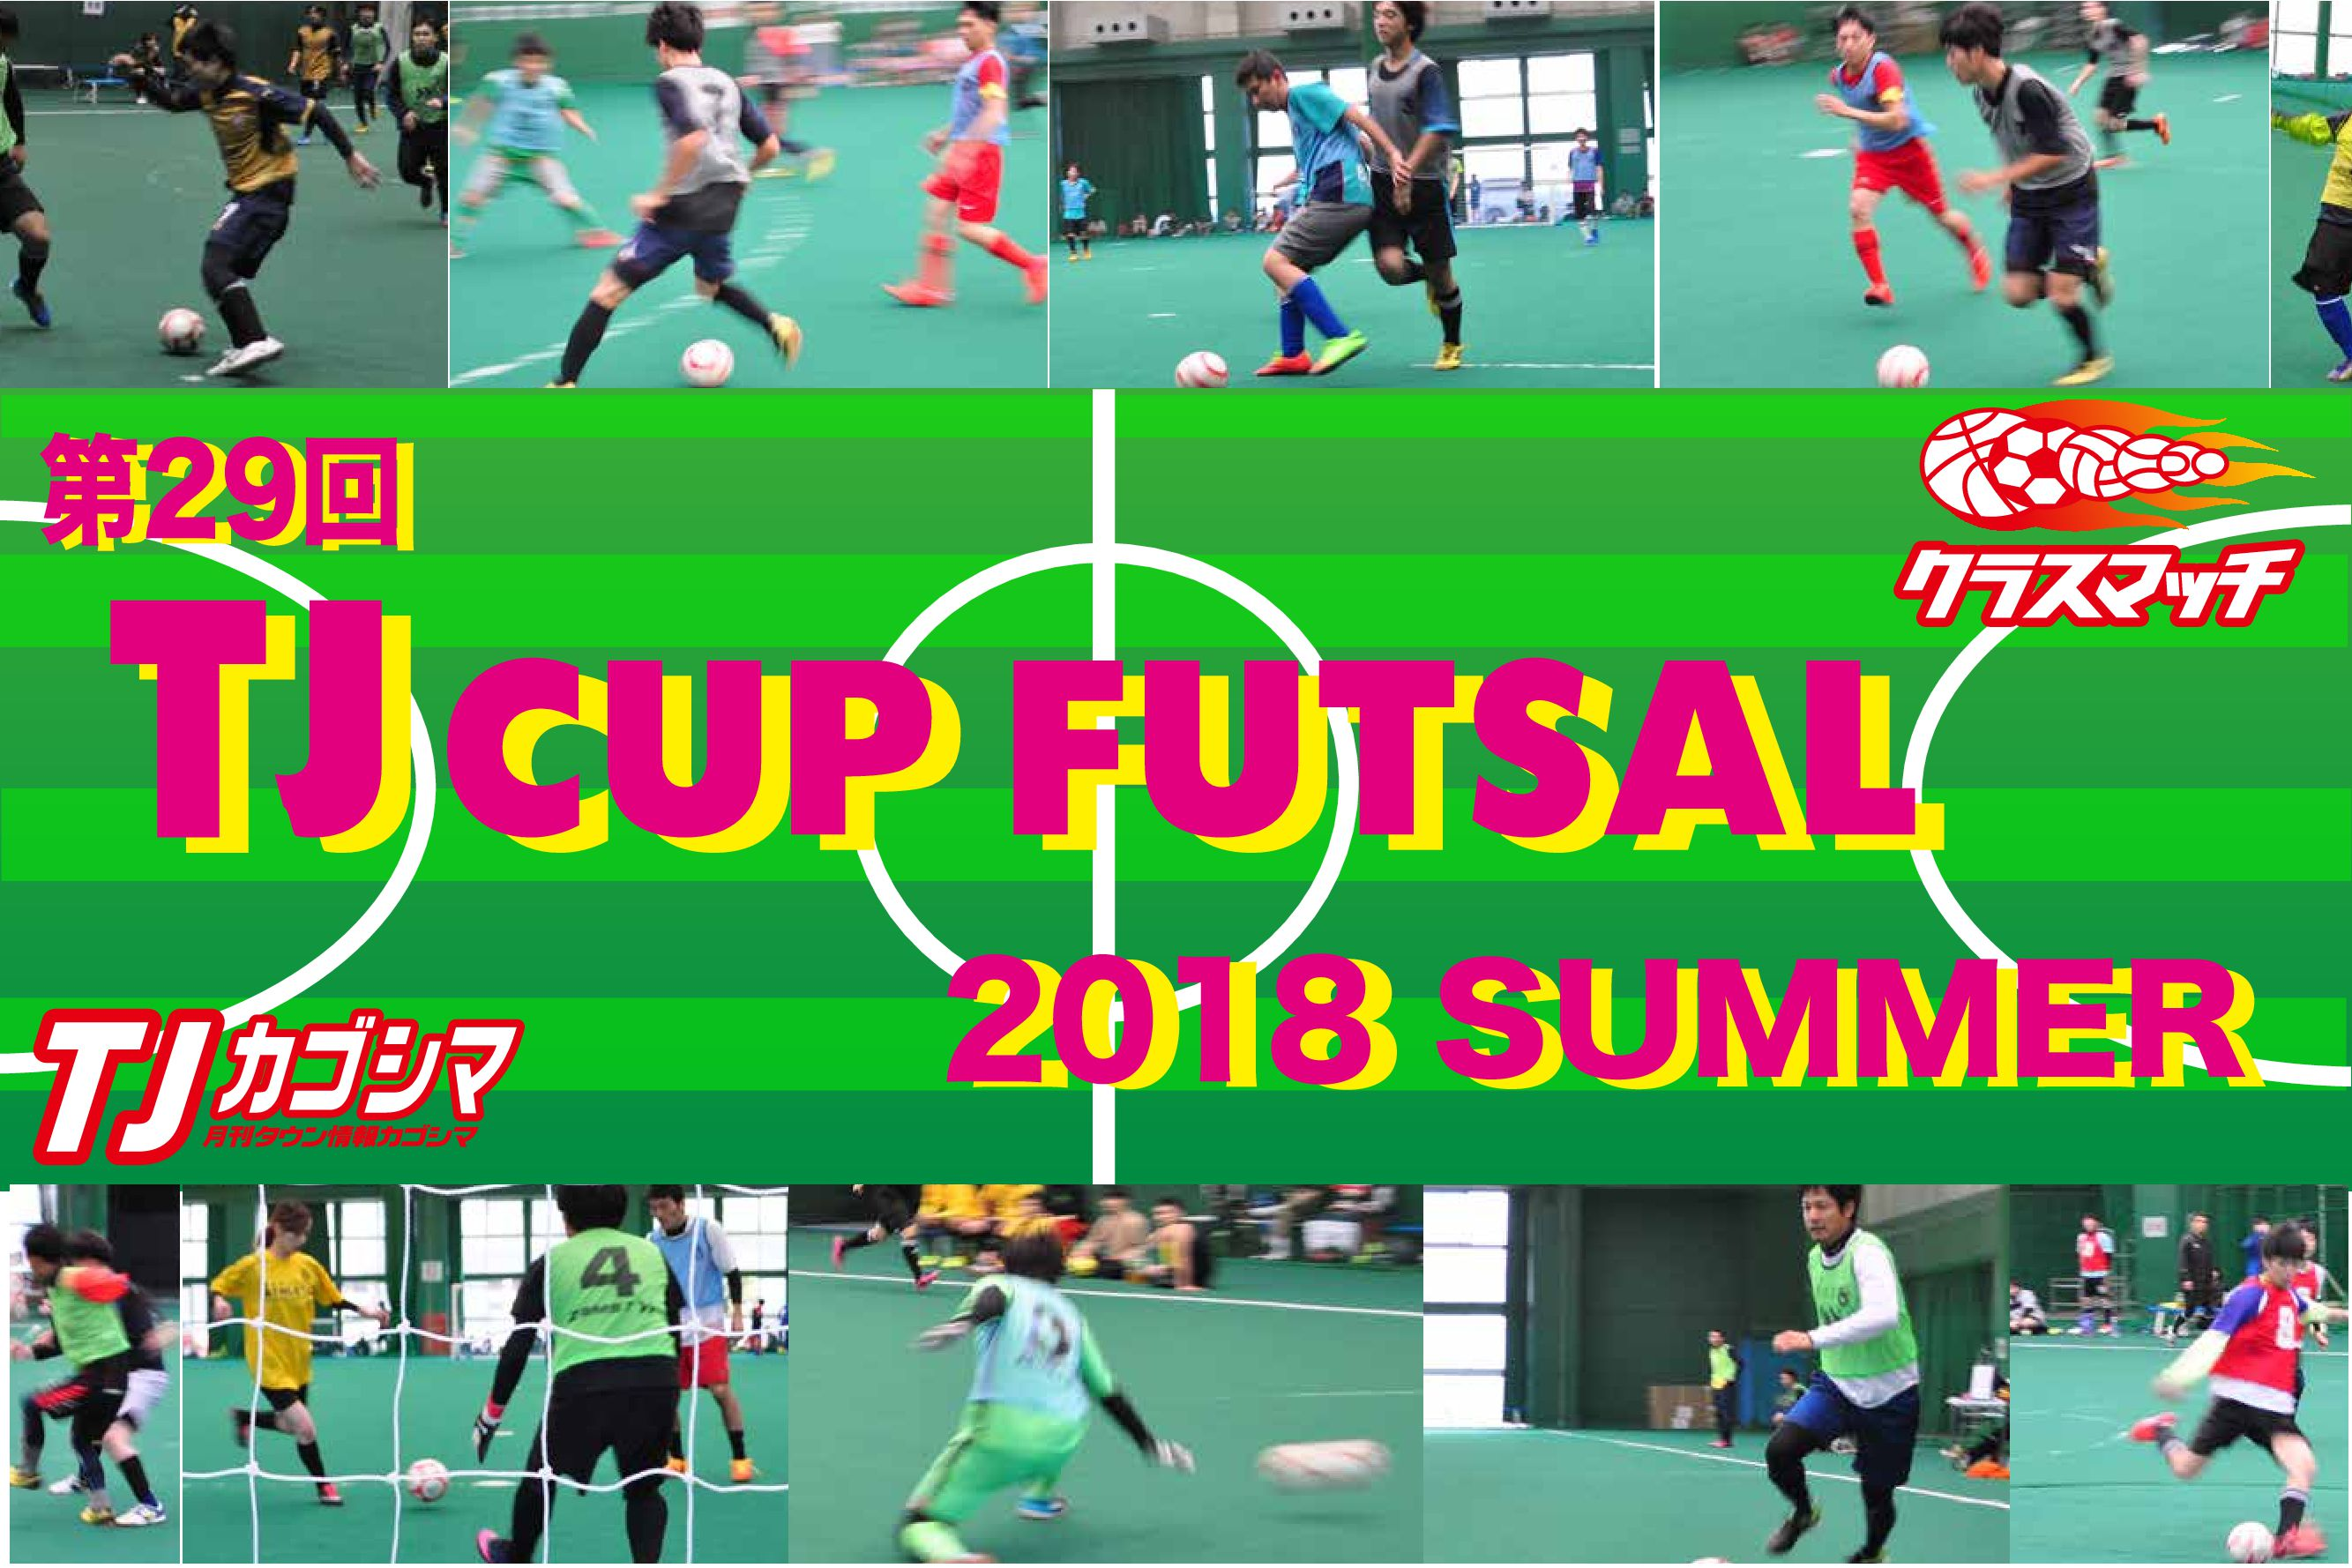 第29回 TJ CUP FUTSAL 2018 SPRING